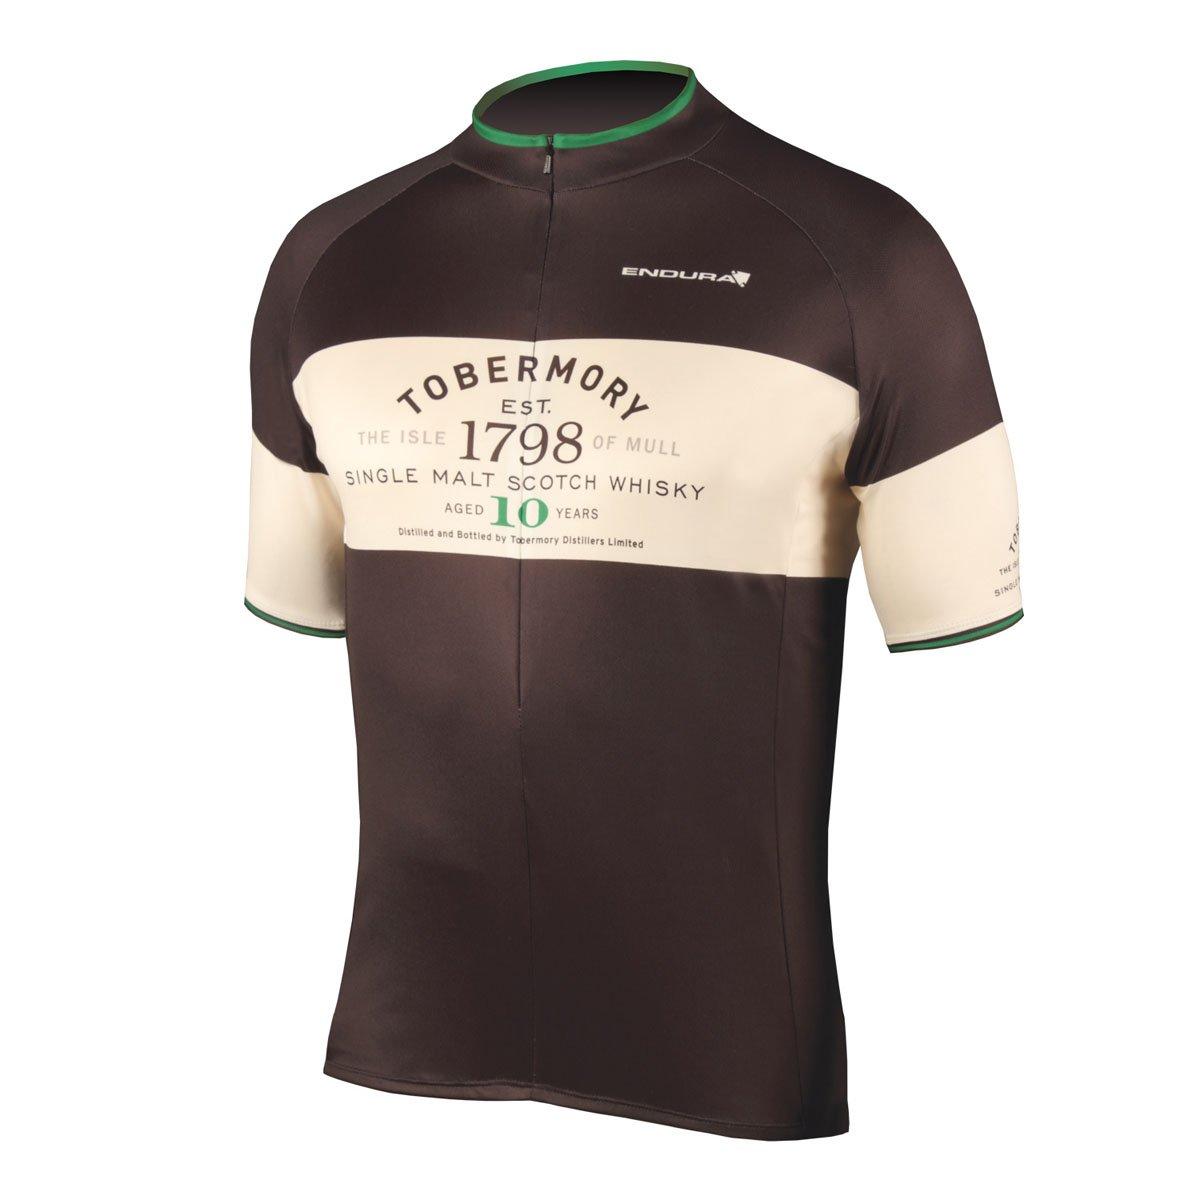 Endura 2015メンズTobermory Whisky Cycling Jersey – e3080 B00LNEQ204 S ブラック ブラック S